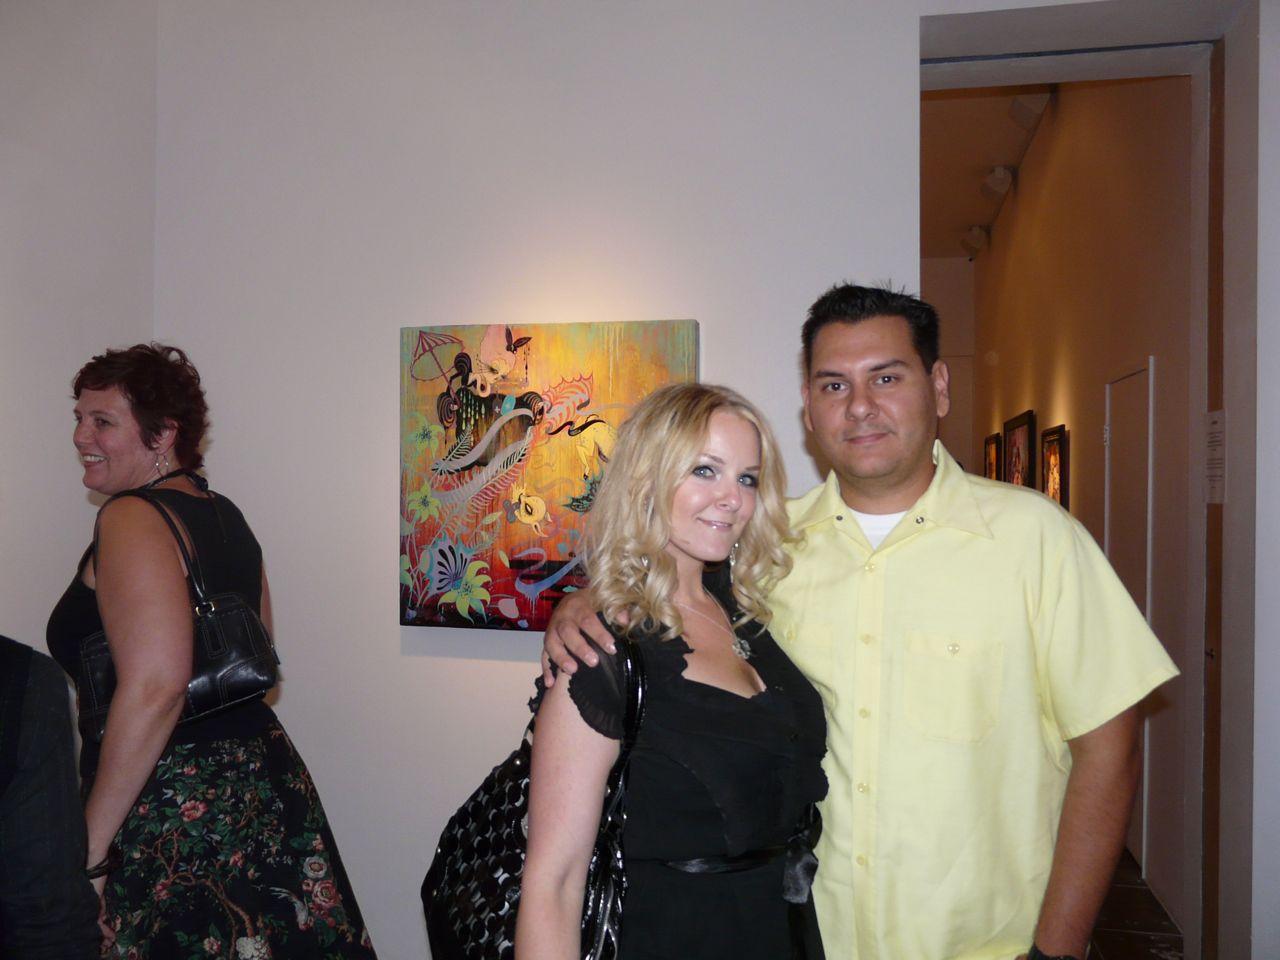 Brandi Milne & guest